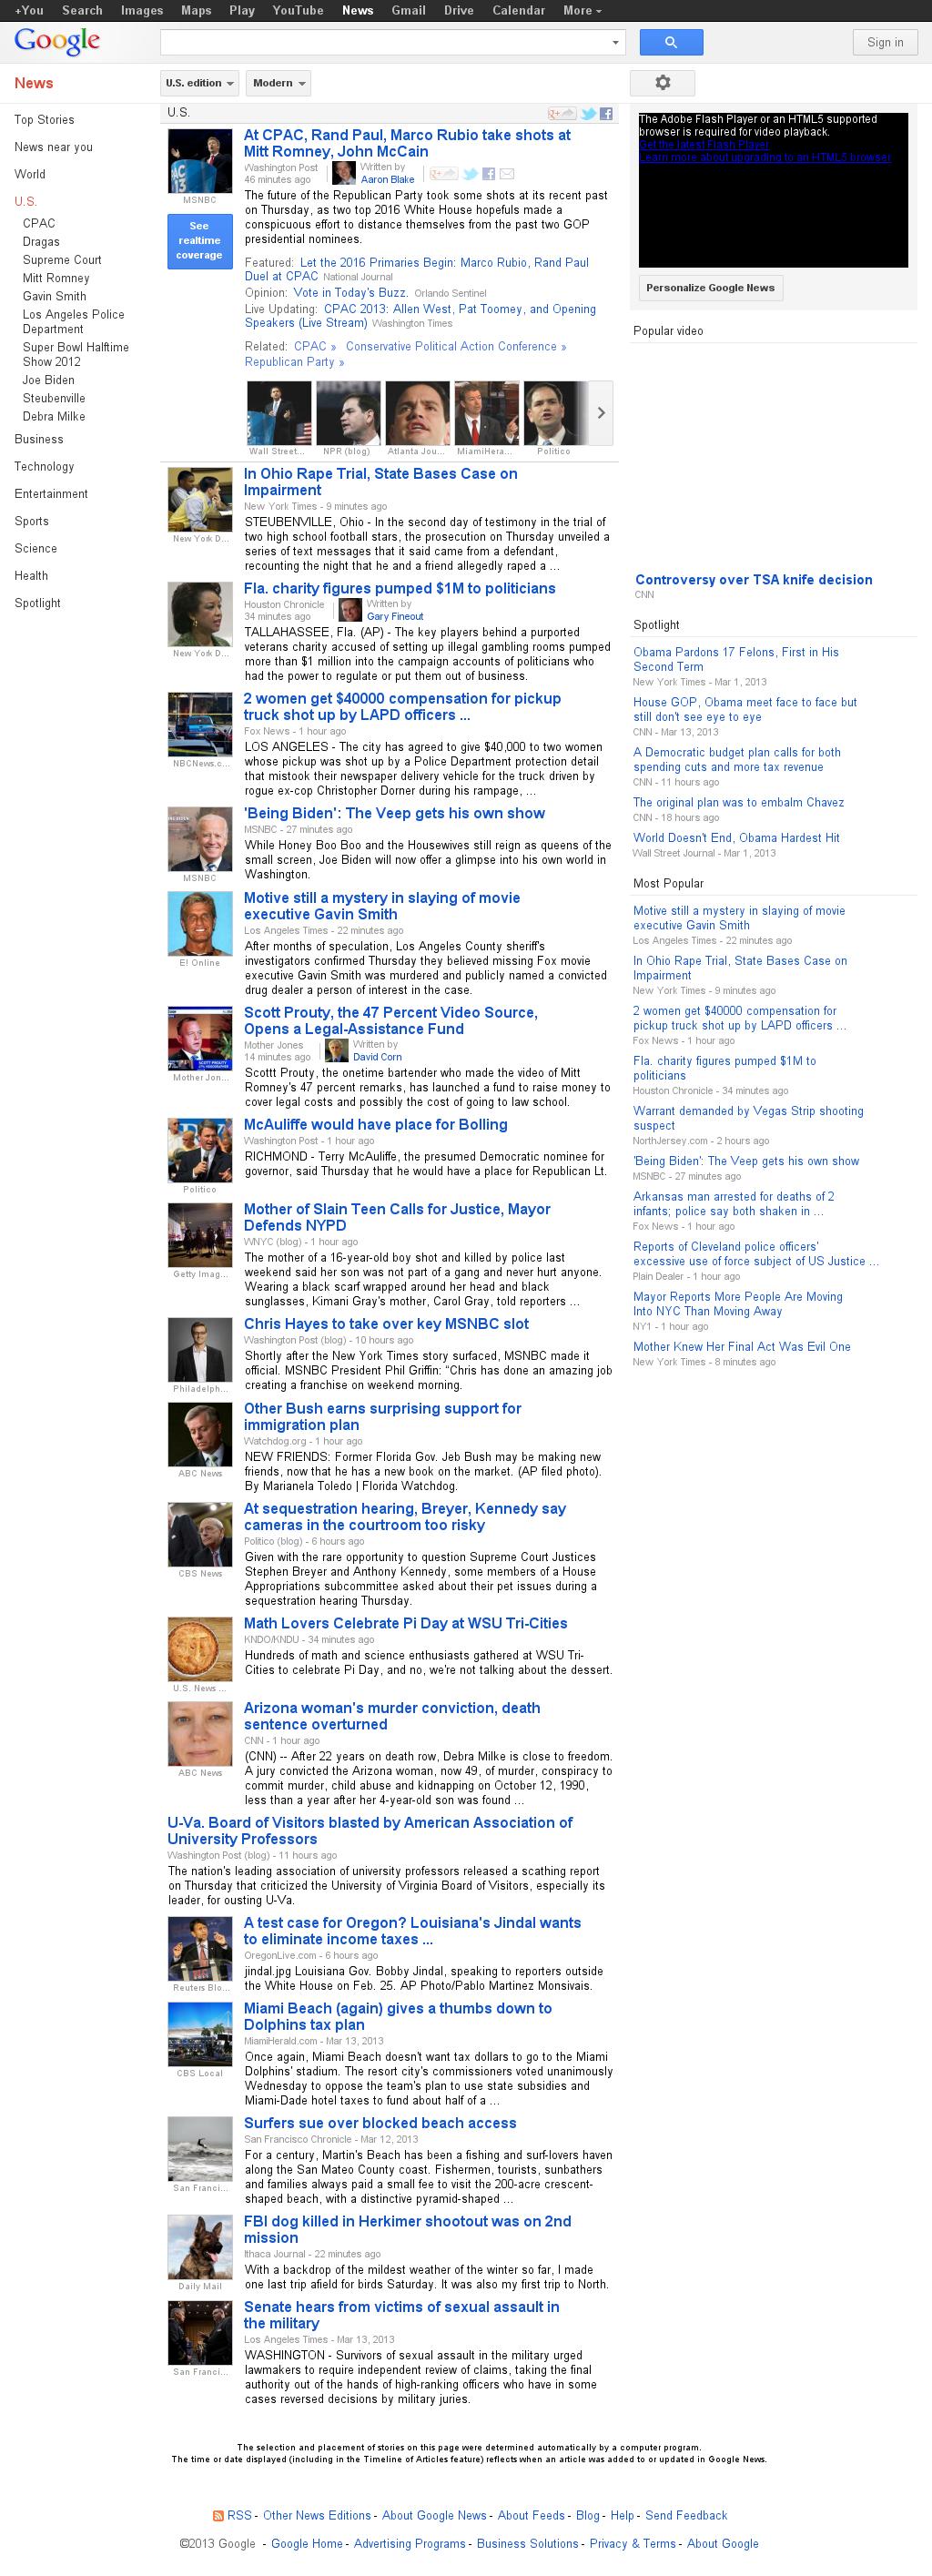 Google News: U.S. at Friday March 15, 2013, 1:10 a.m. UTC